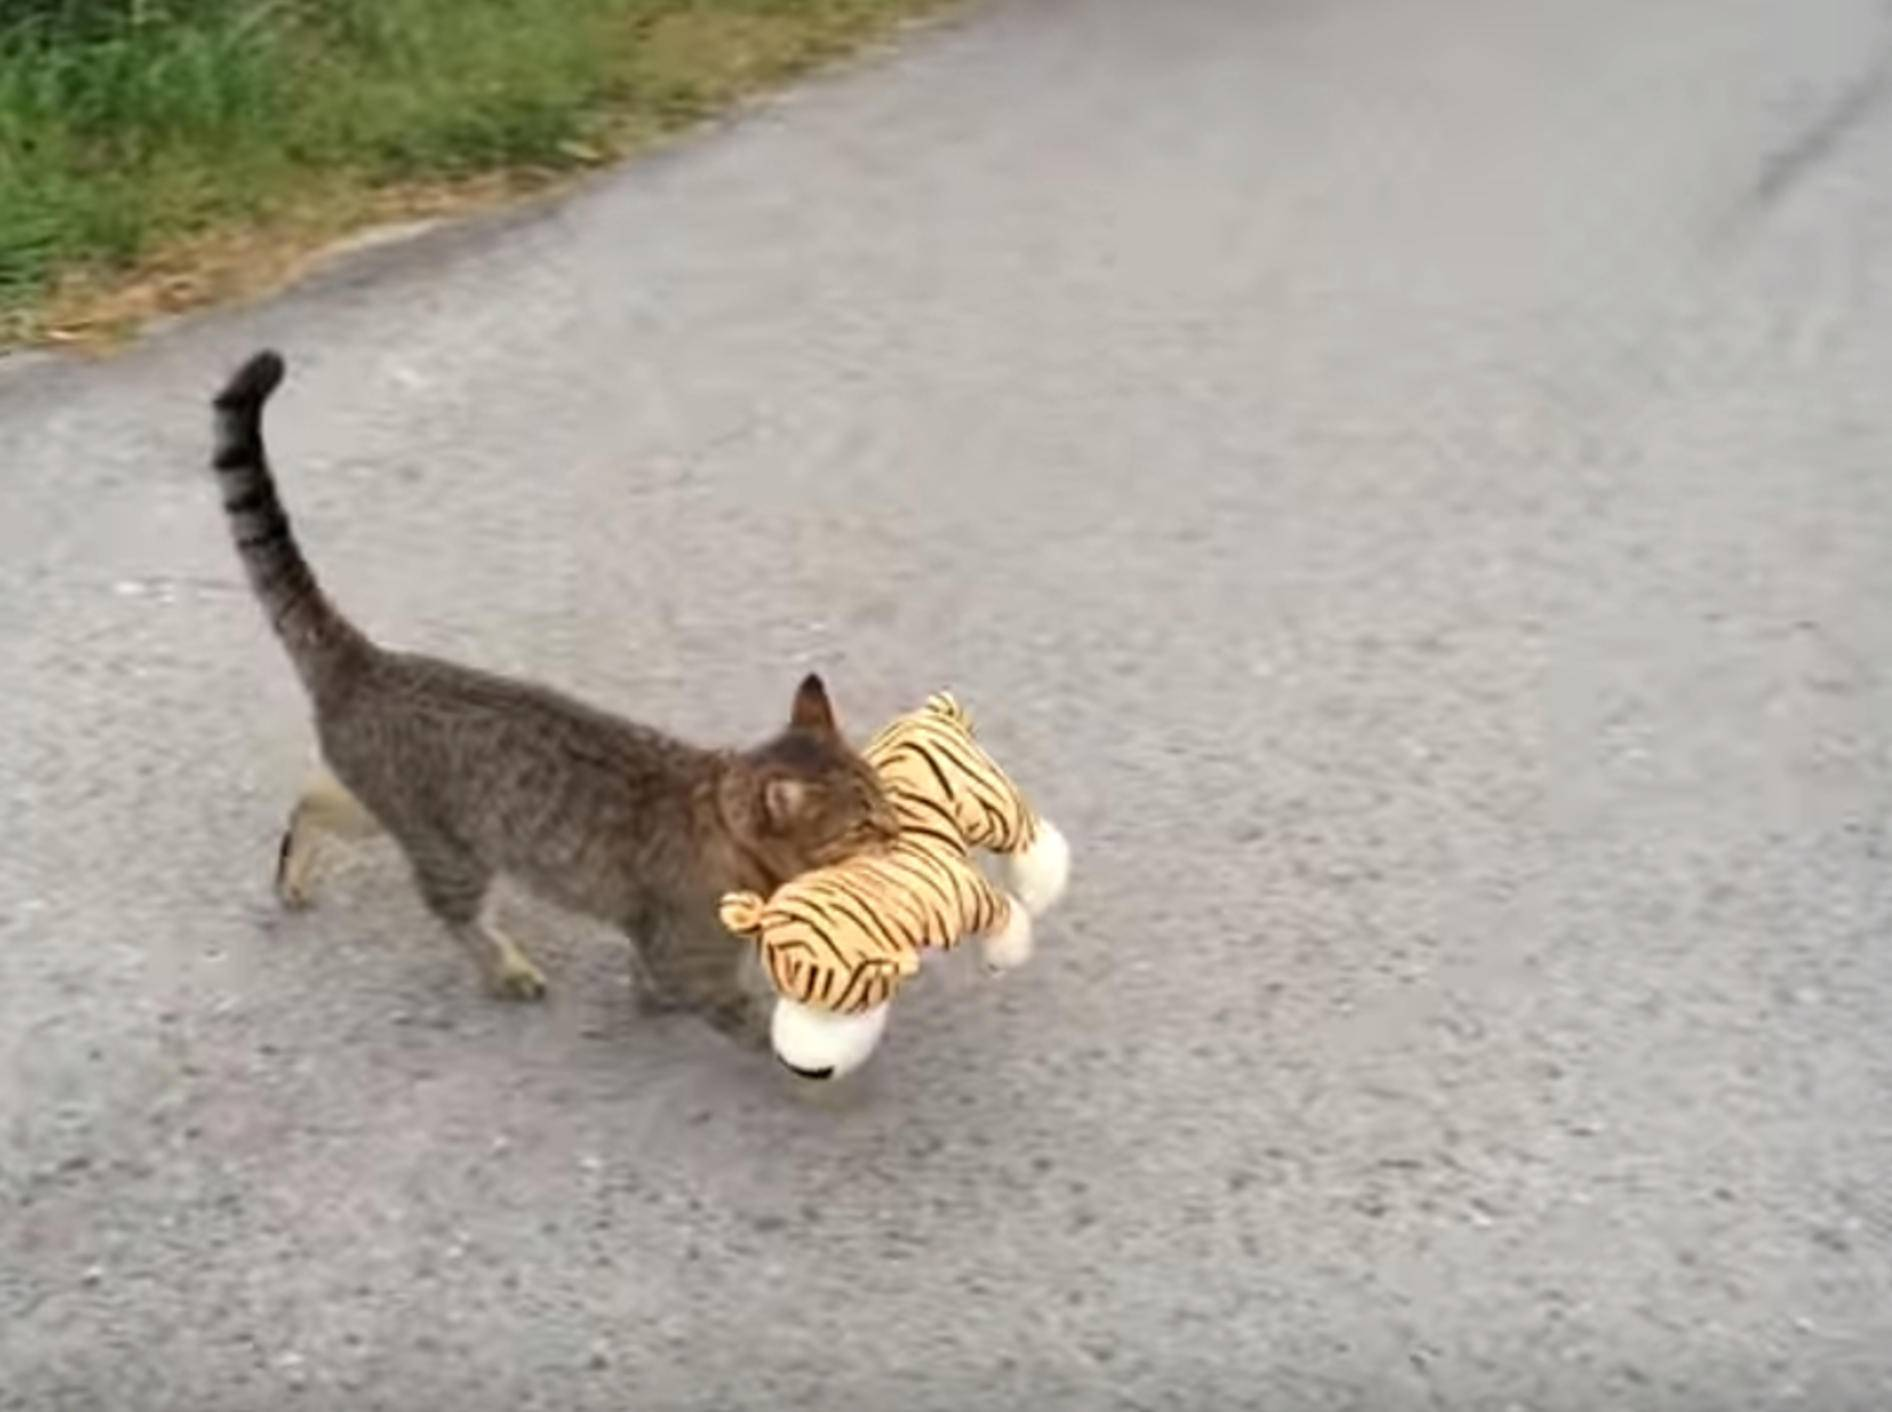 Pfiffige Katze klaut Kuscheltier vom Nachbarn – Bild: YouTube / Borut Birsa